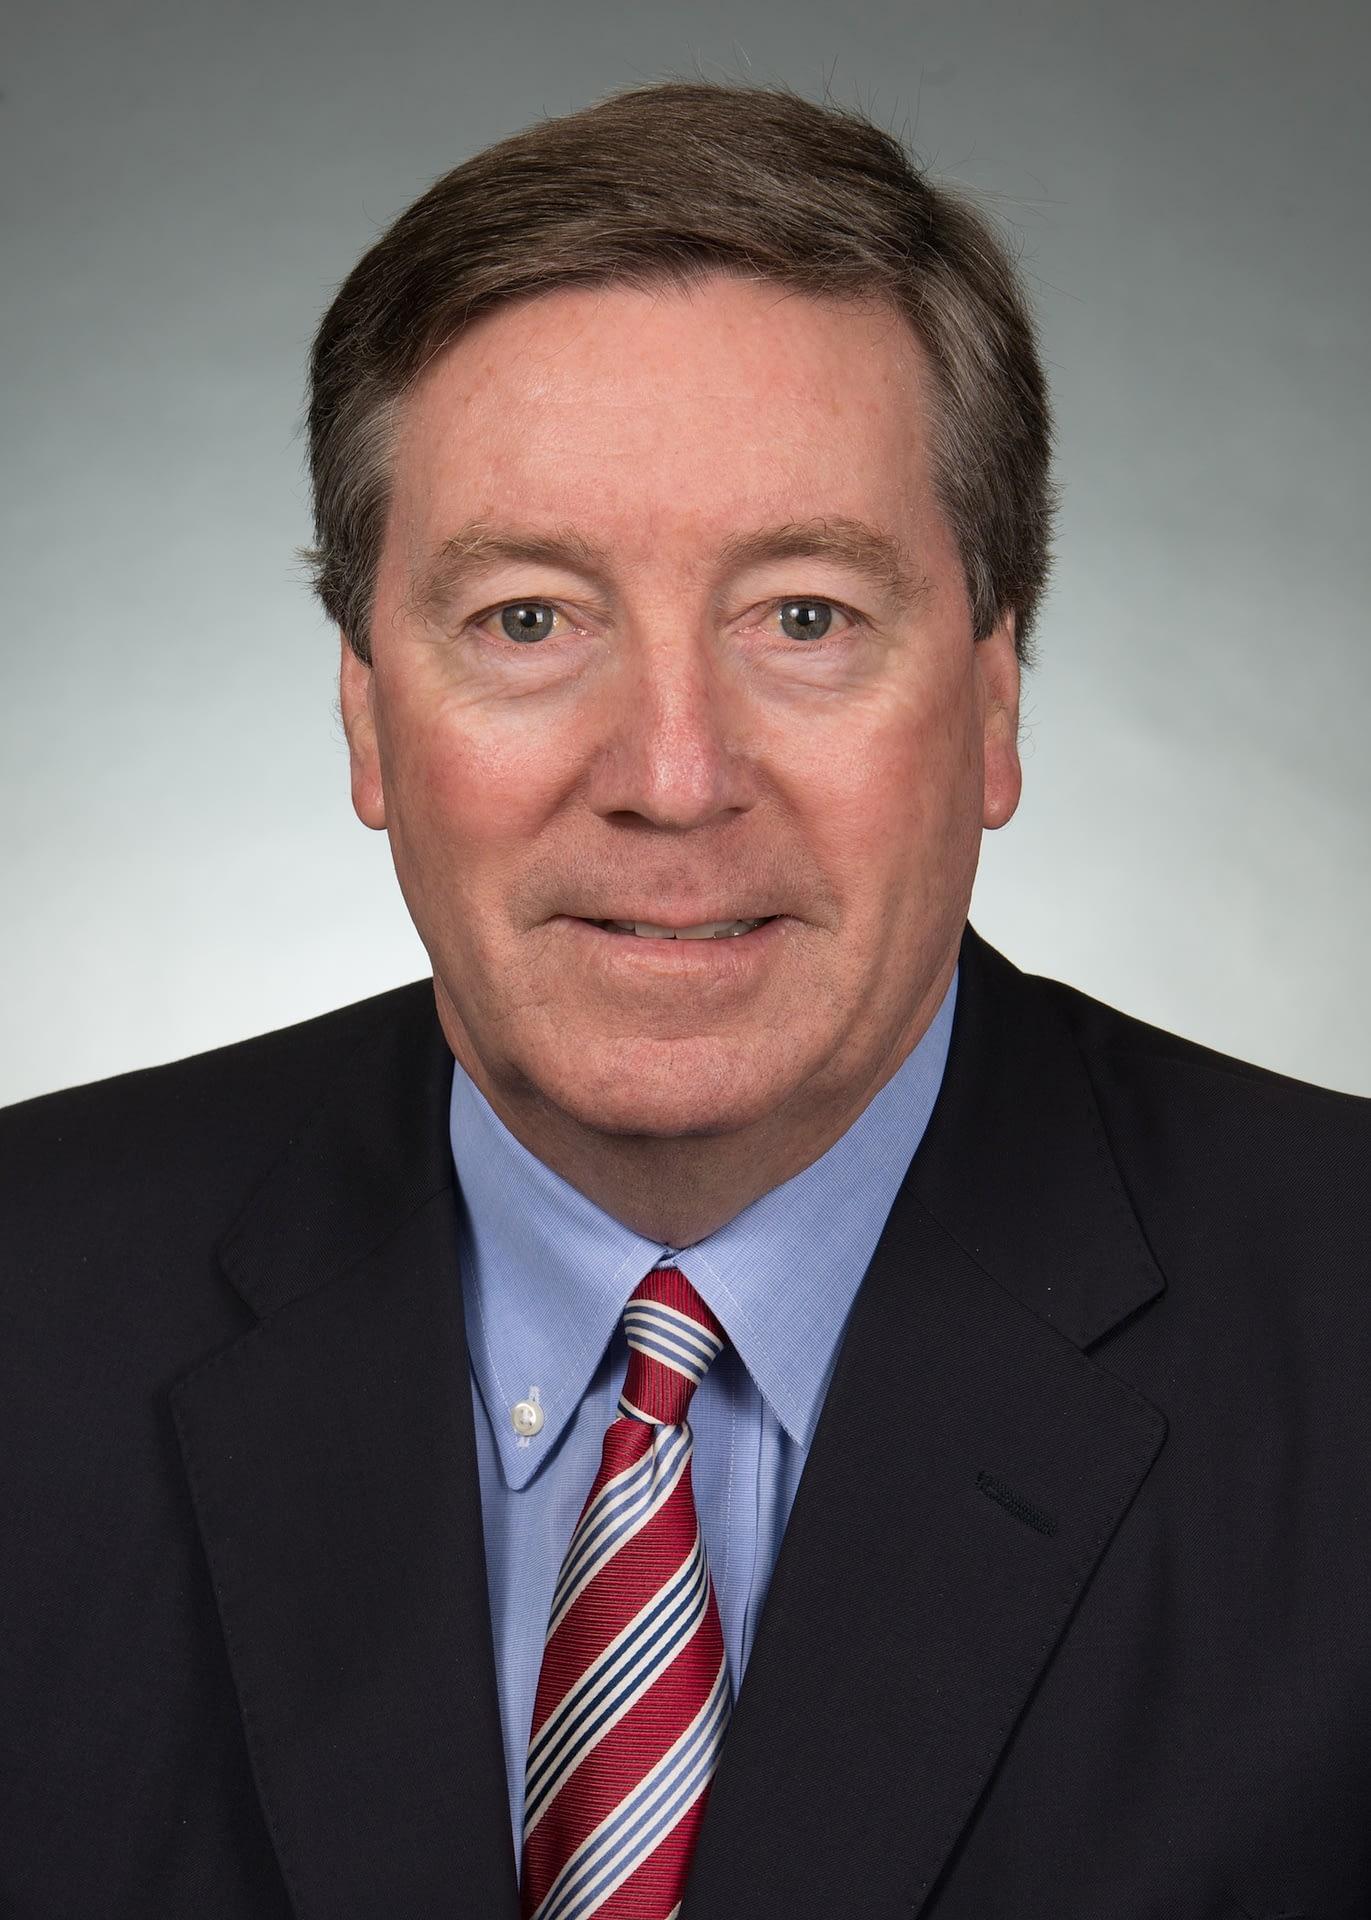 Gavin Bender, Sr.